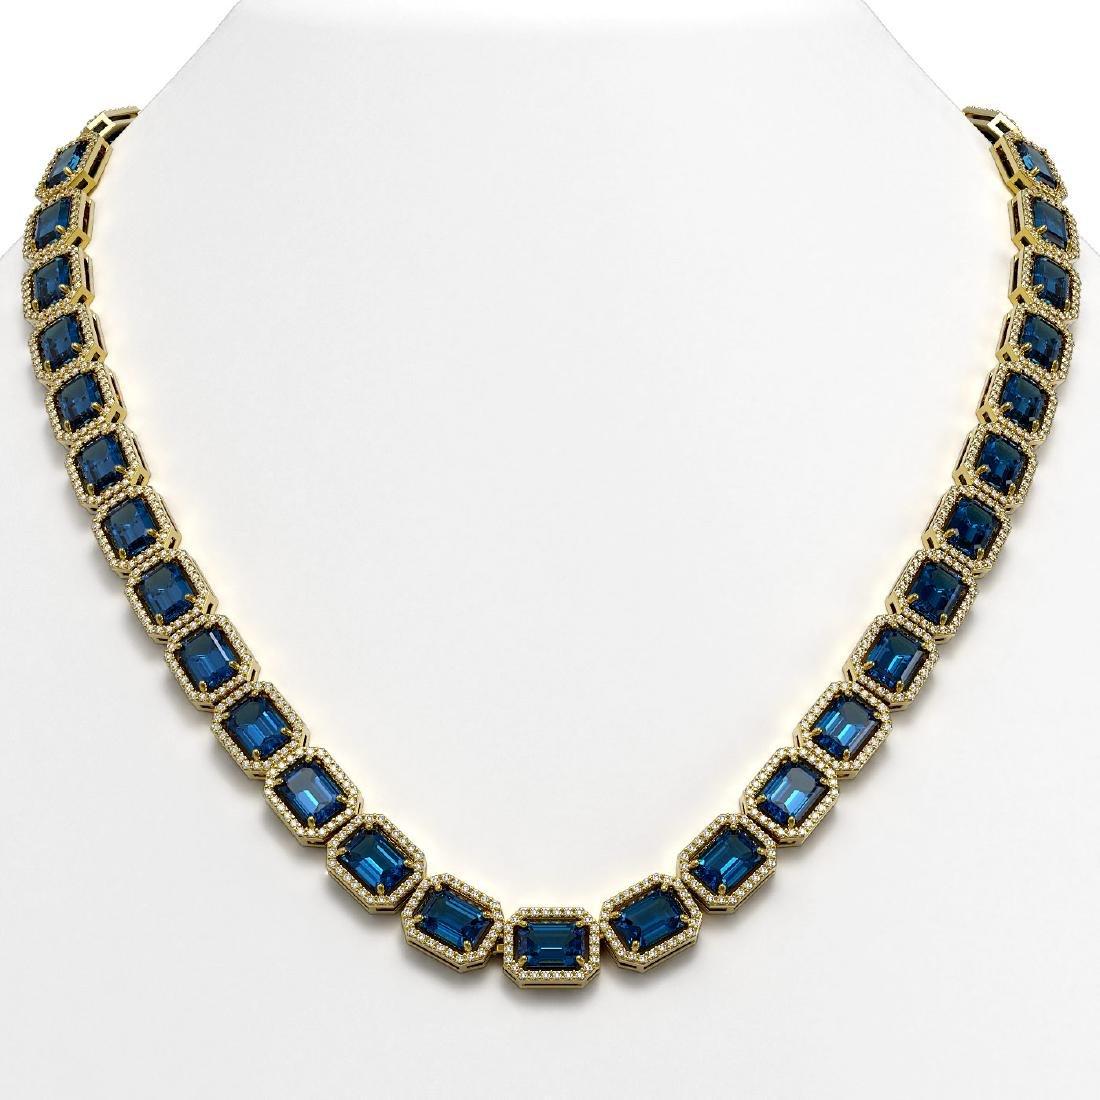 56.69 CTW London Topaz & Diamond Halo Necklace 10K